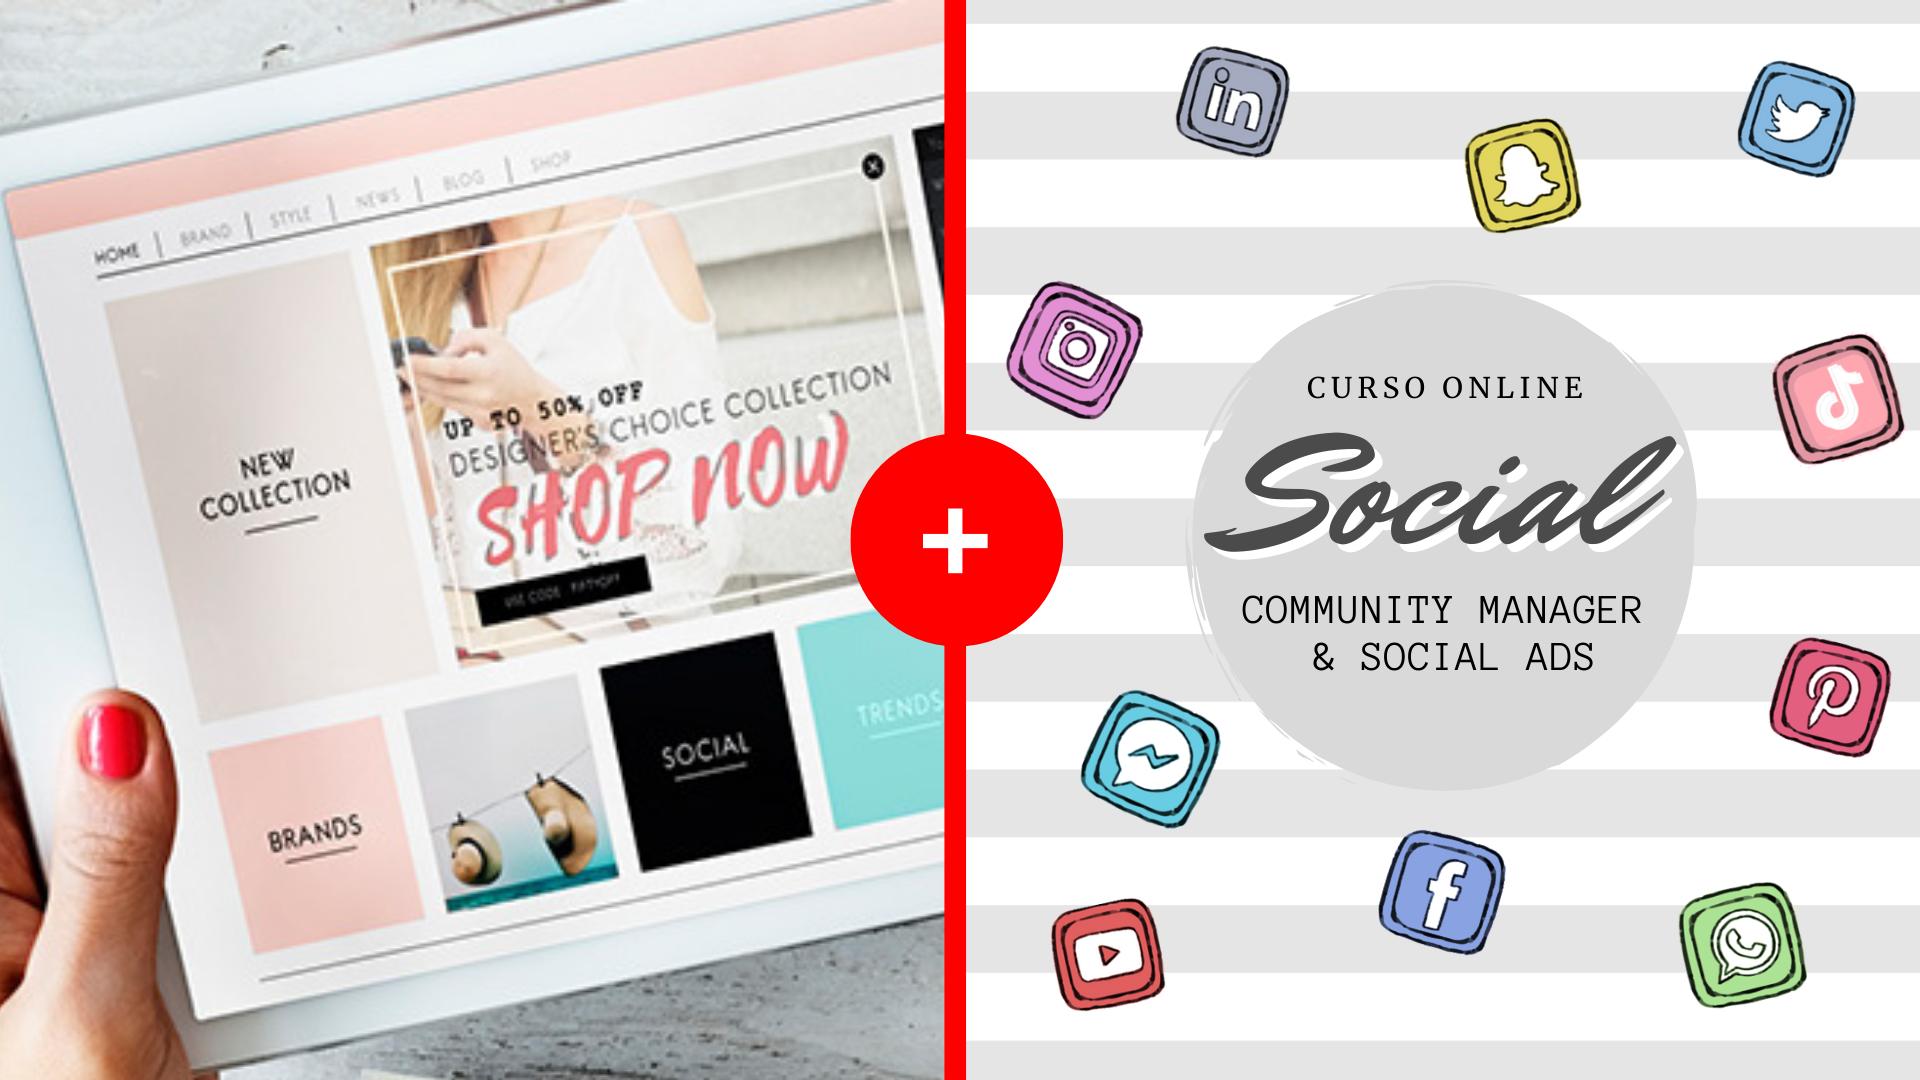 Curso de eCommerce + Curso de Redes Sociales